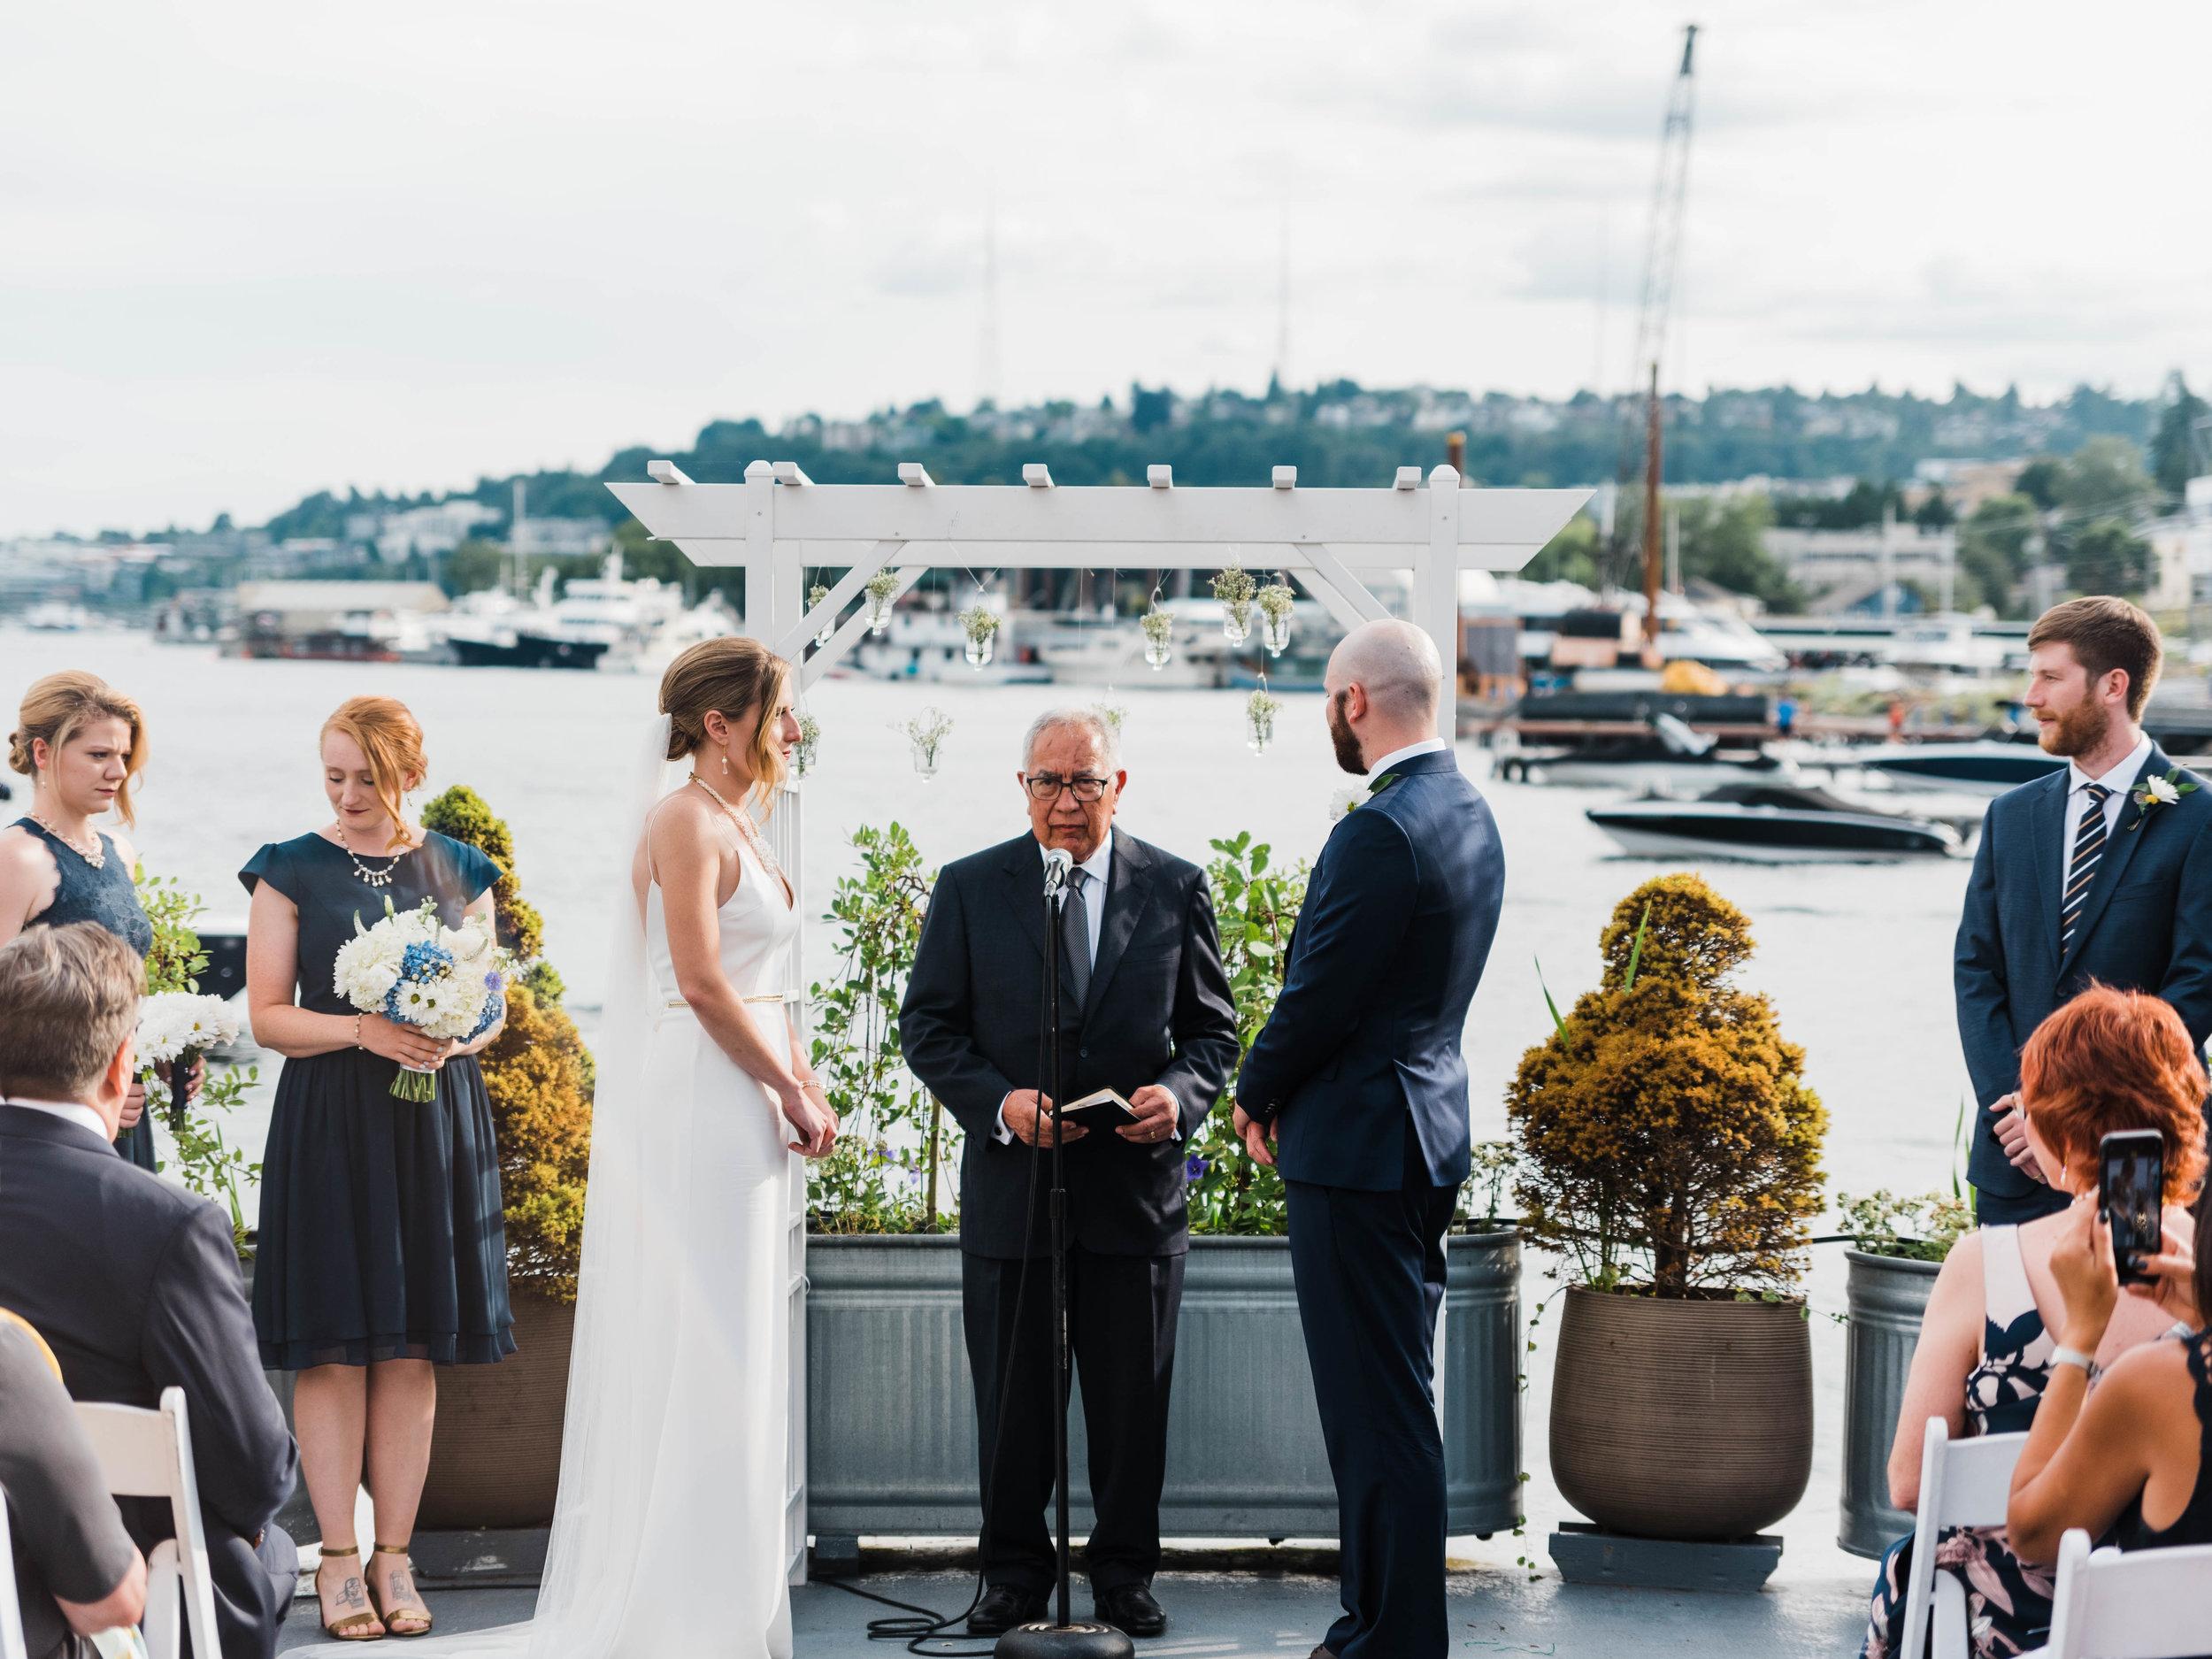 Seattle Wedding- MV Skansonia - Anna + Josh -  (1444) - Copy.jpg